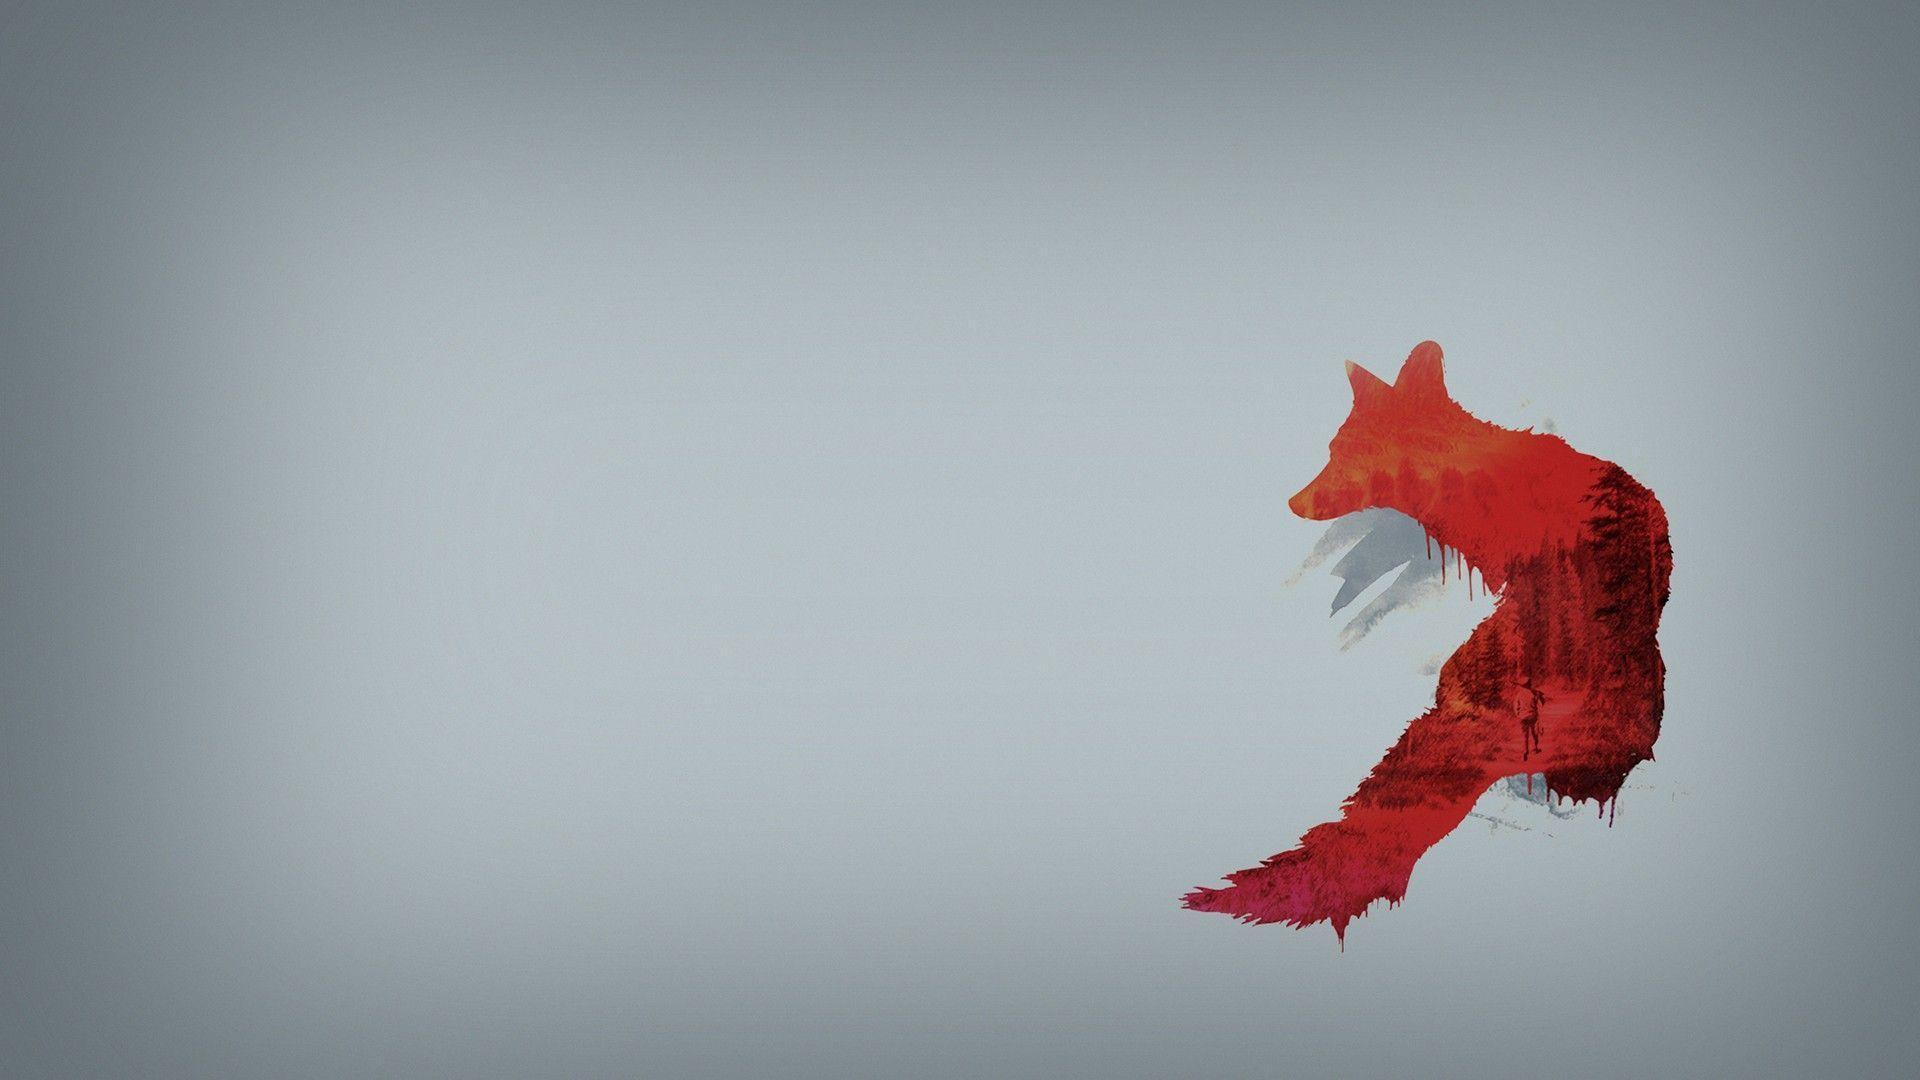 Red Fox 1080p HD Wallpaper | HD Wallpapers Source